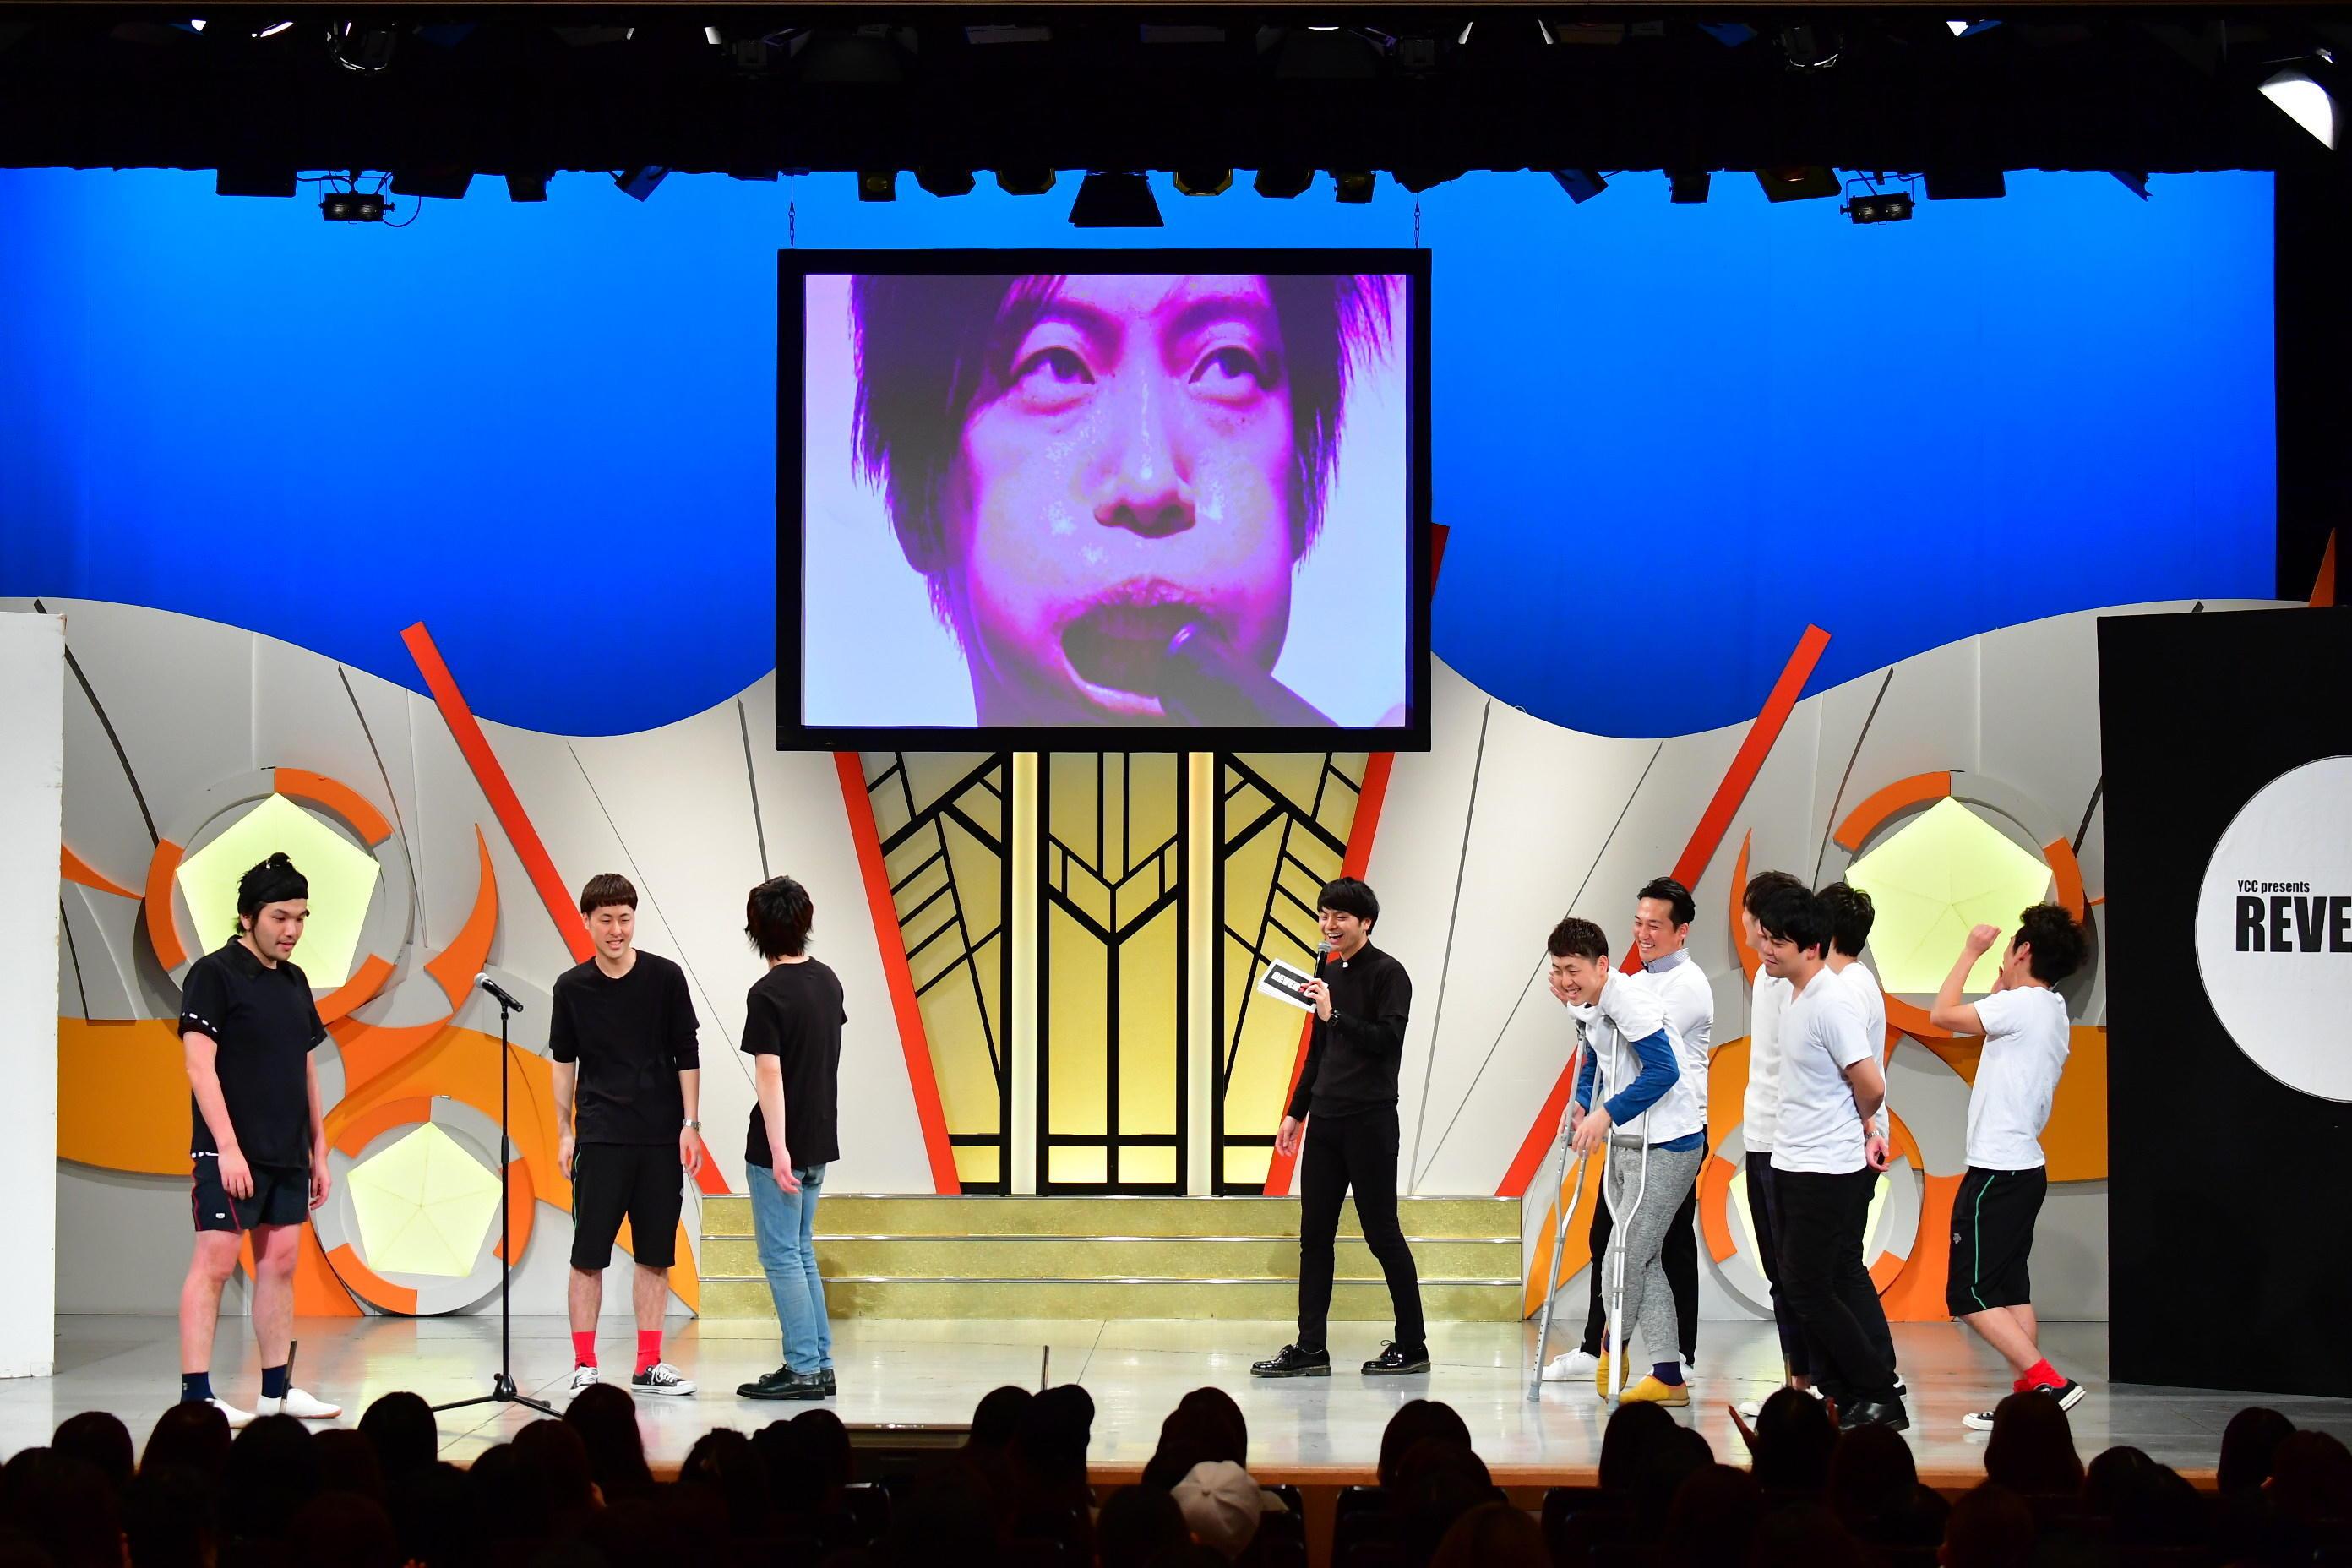 http://news.yoshimoto.co.jp/20180305134409-efbdd2a22b6849fdbf787f951d4a87c51ea417ea.jpg